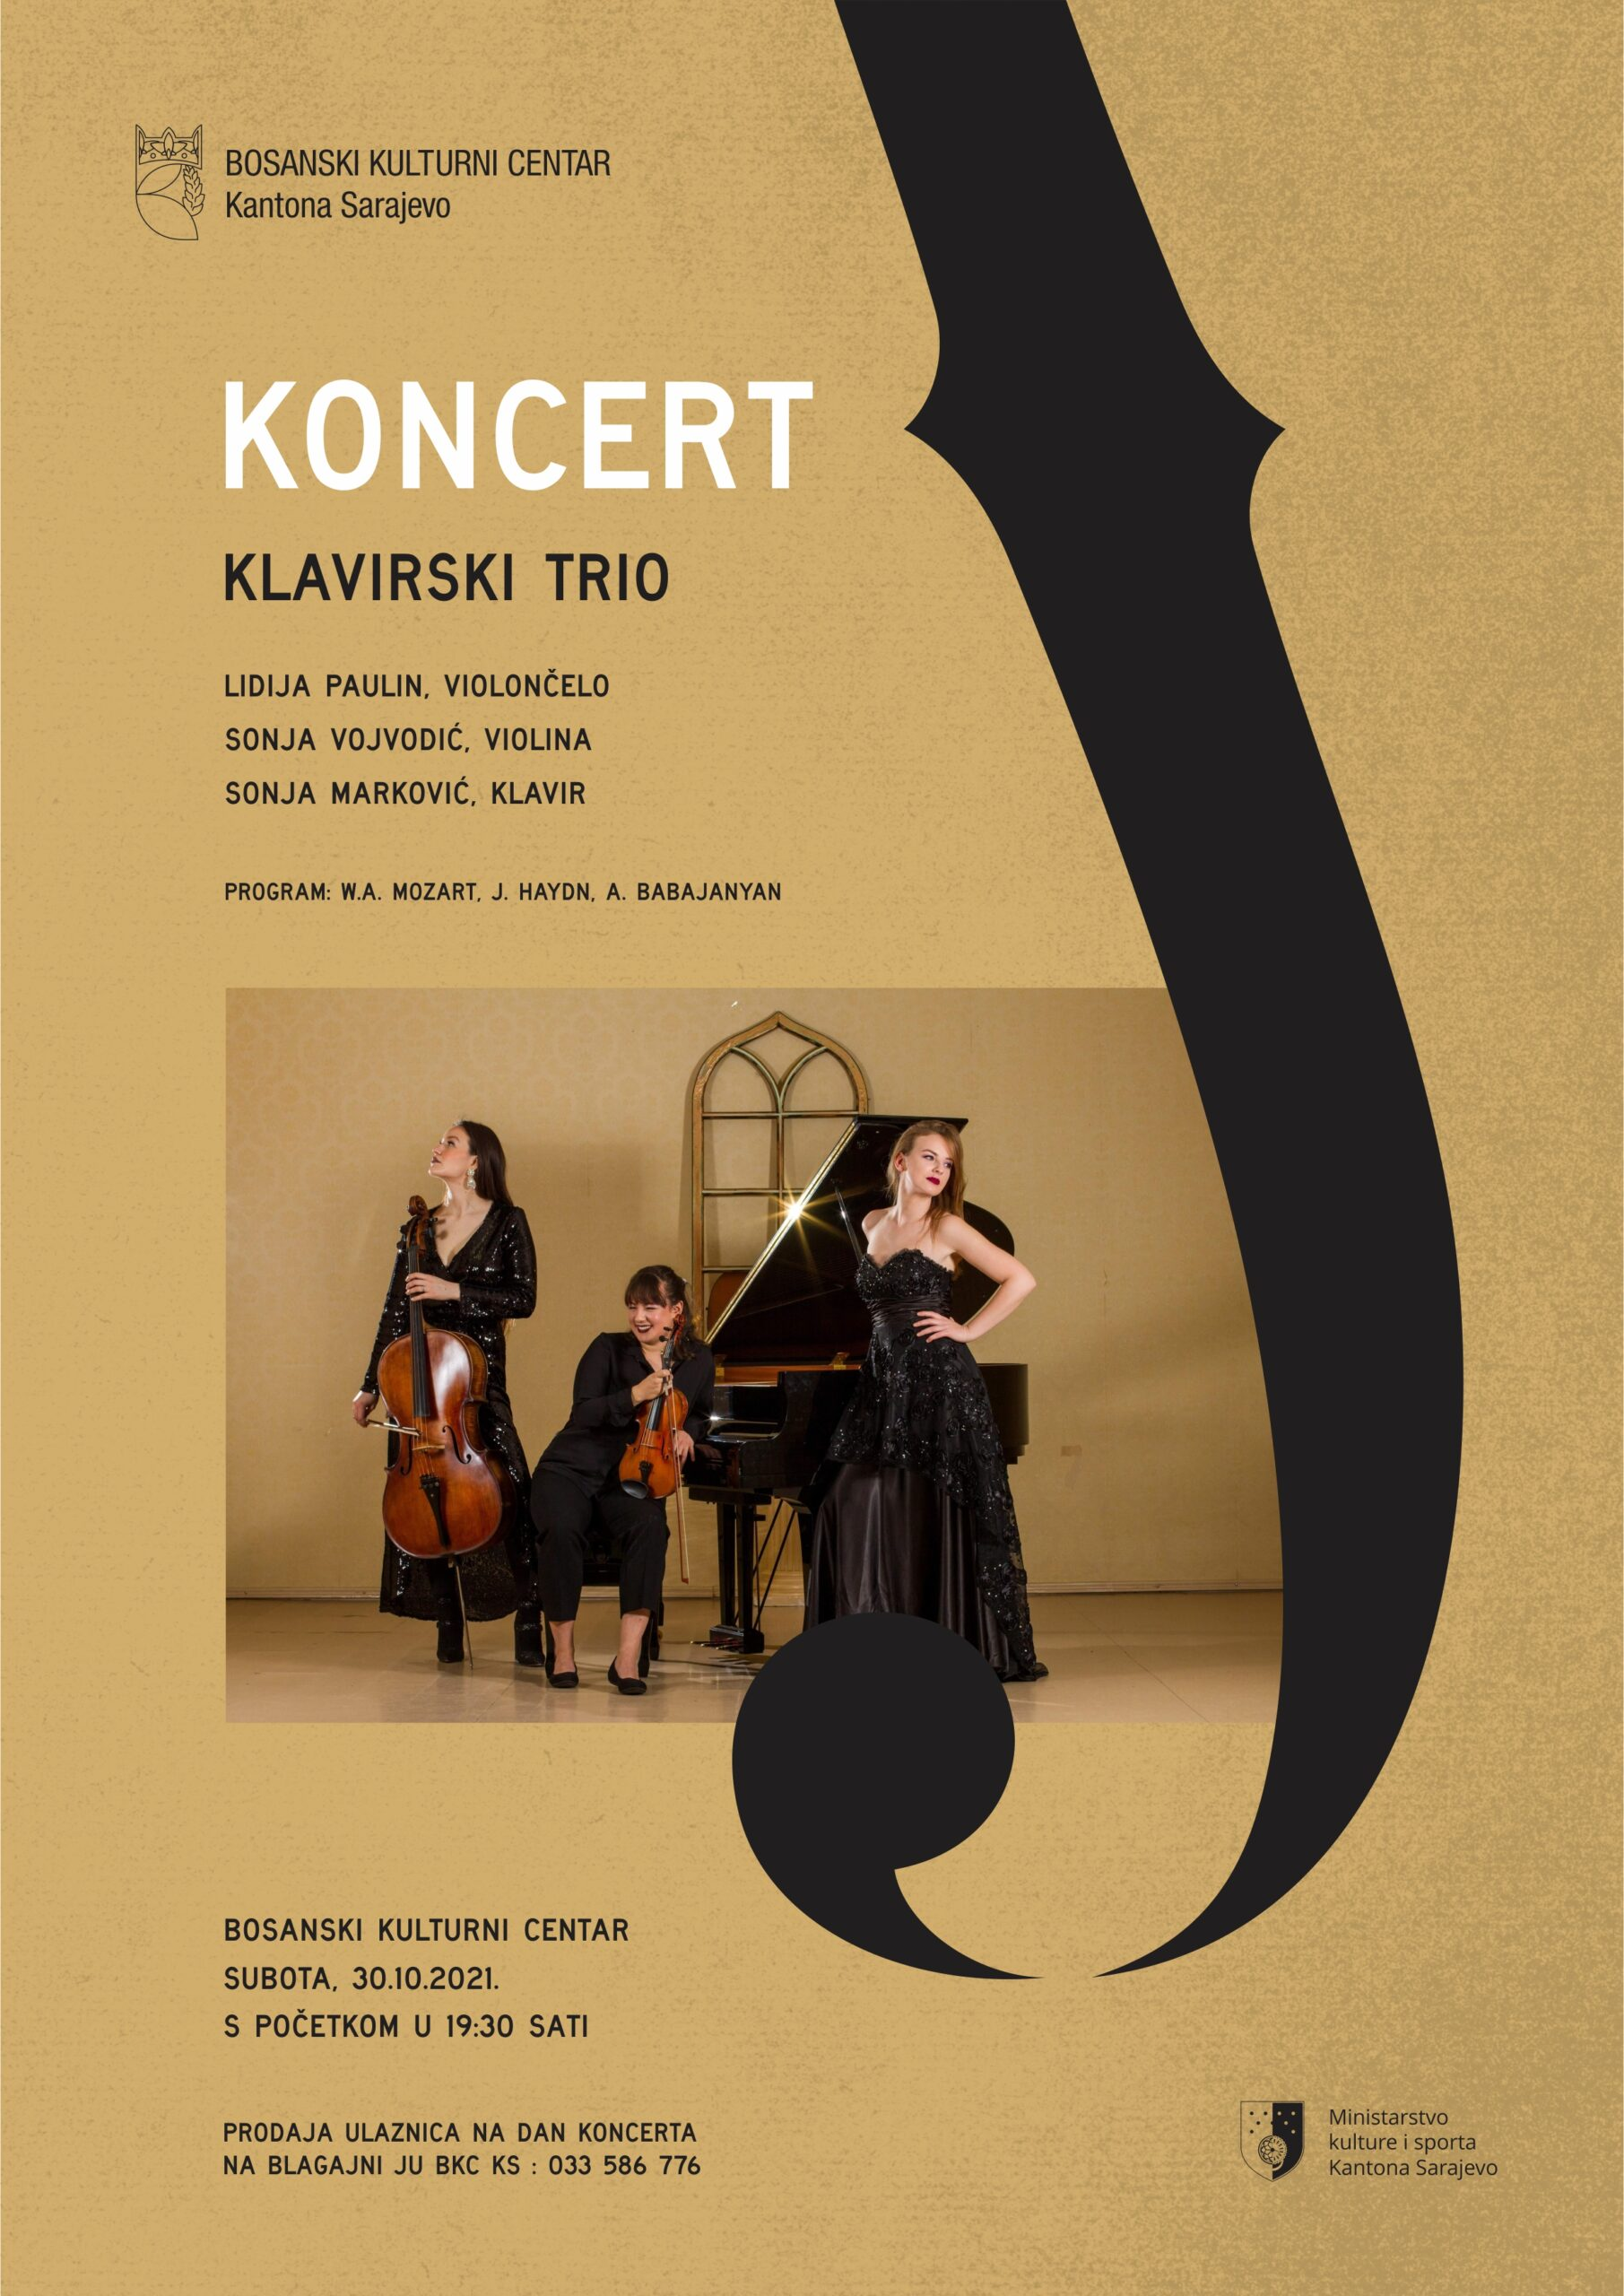 KLAVIRSKI TRIO: LIDIJA PAULIN, violončelo, SONJA VOJVODIĆ, violina i SONJA MARKOVIĆ, klavir, 30. 10. 2021.